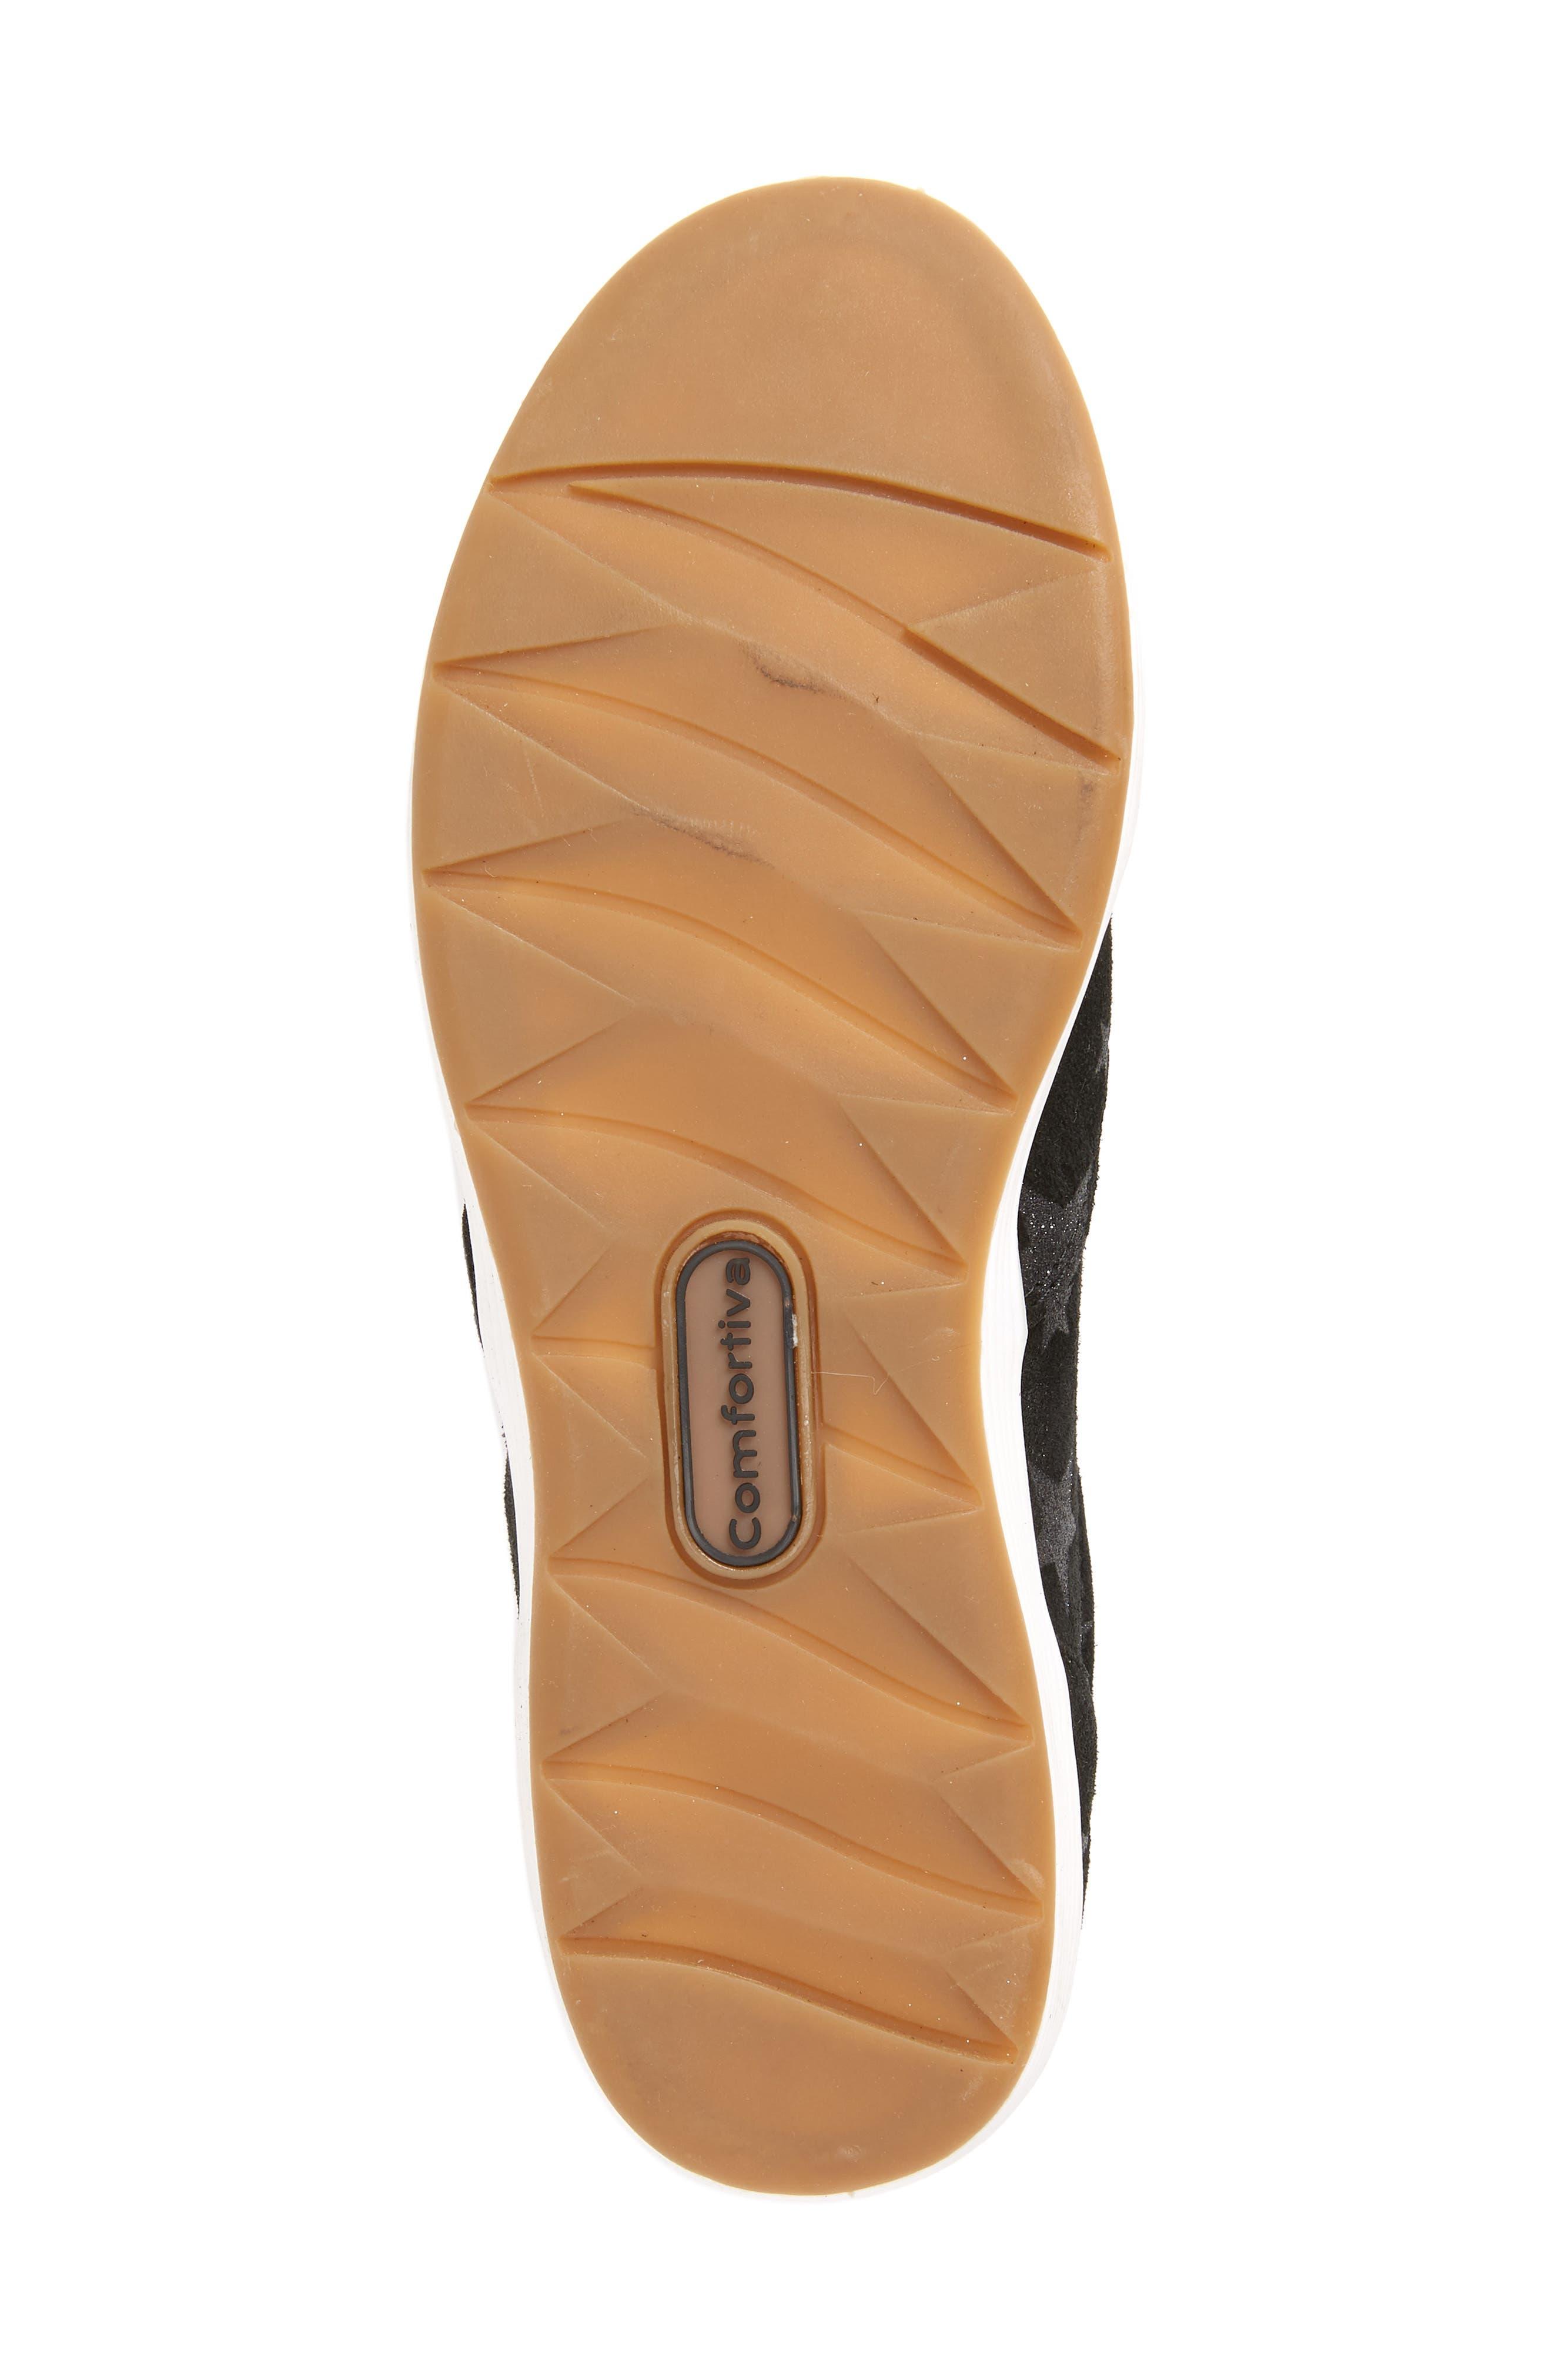 Linette Suede Slip-On Sneaker,                             Alternate thumbnail 6, color,                             BLACK SUEDE